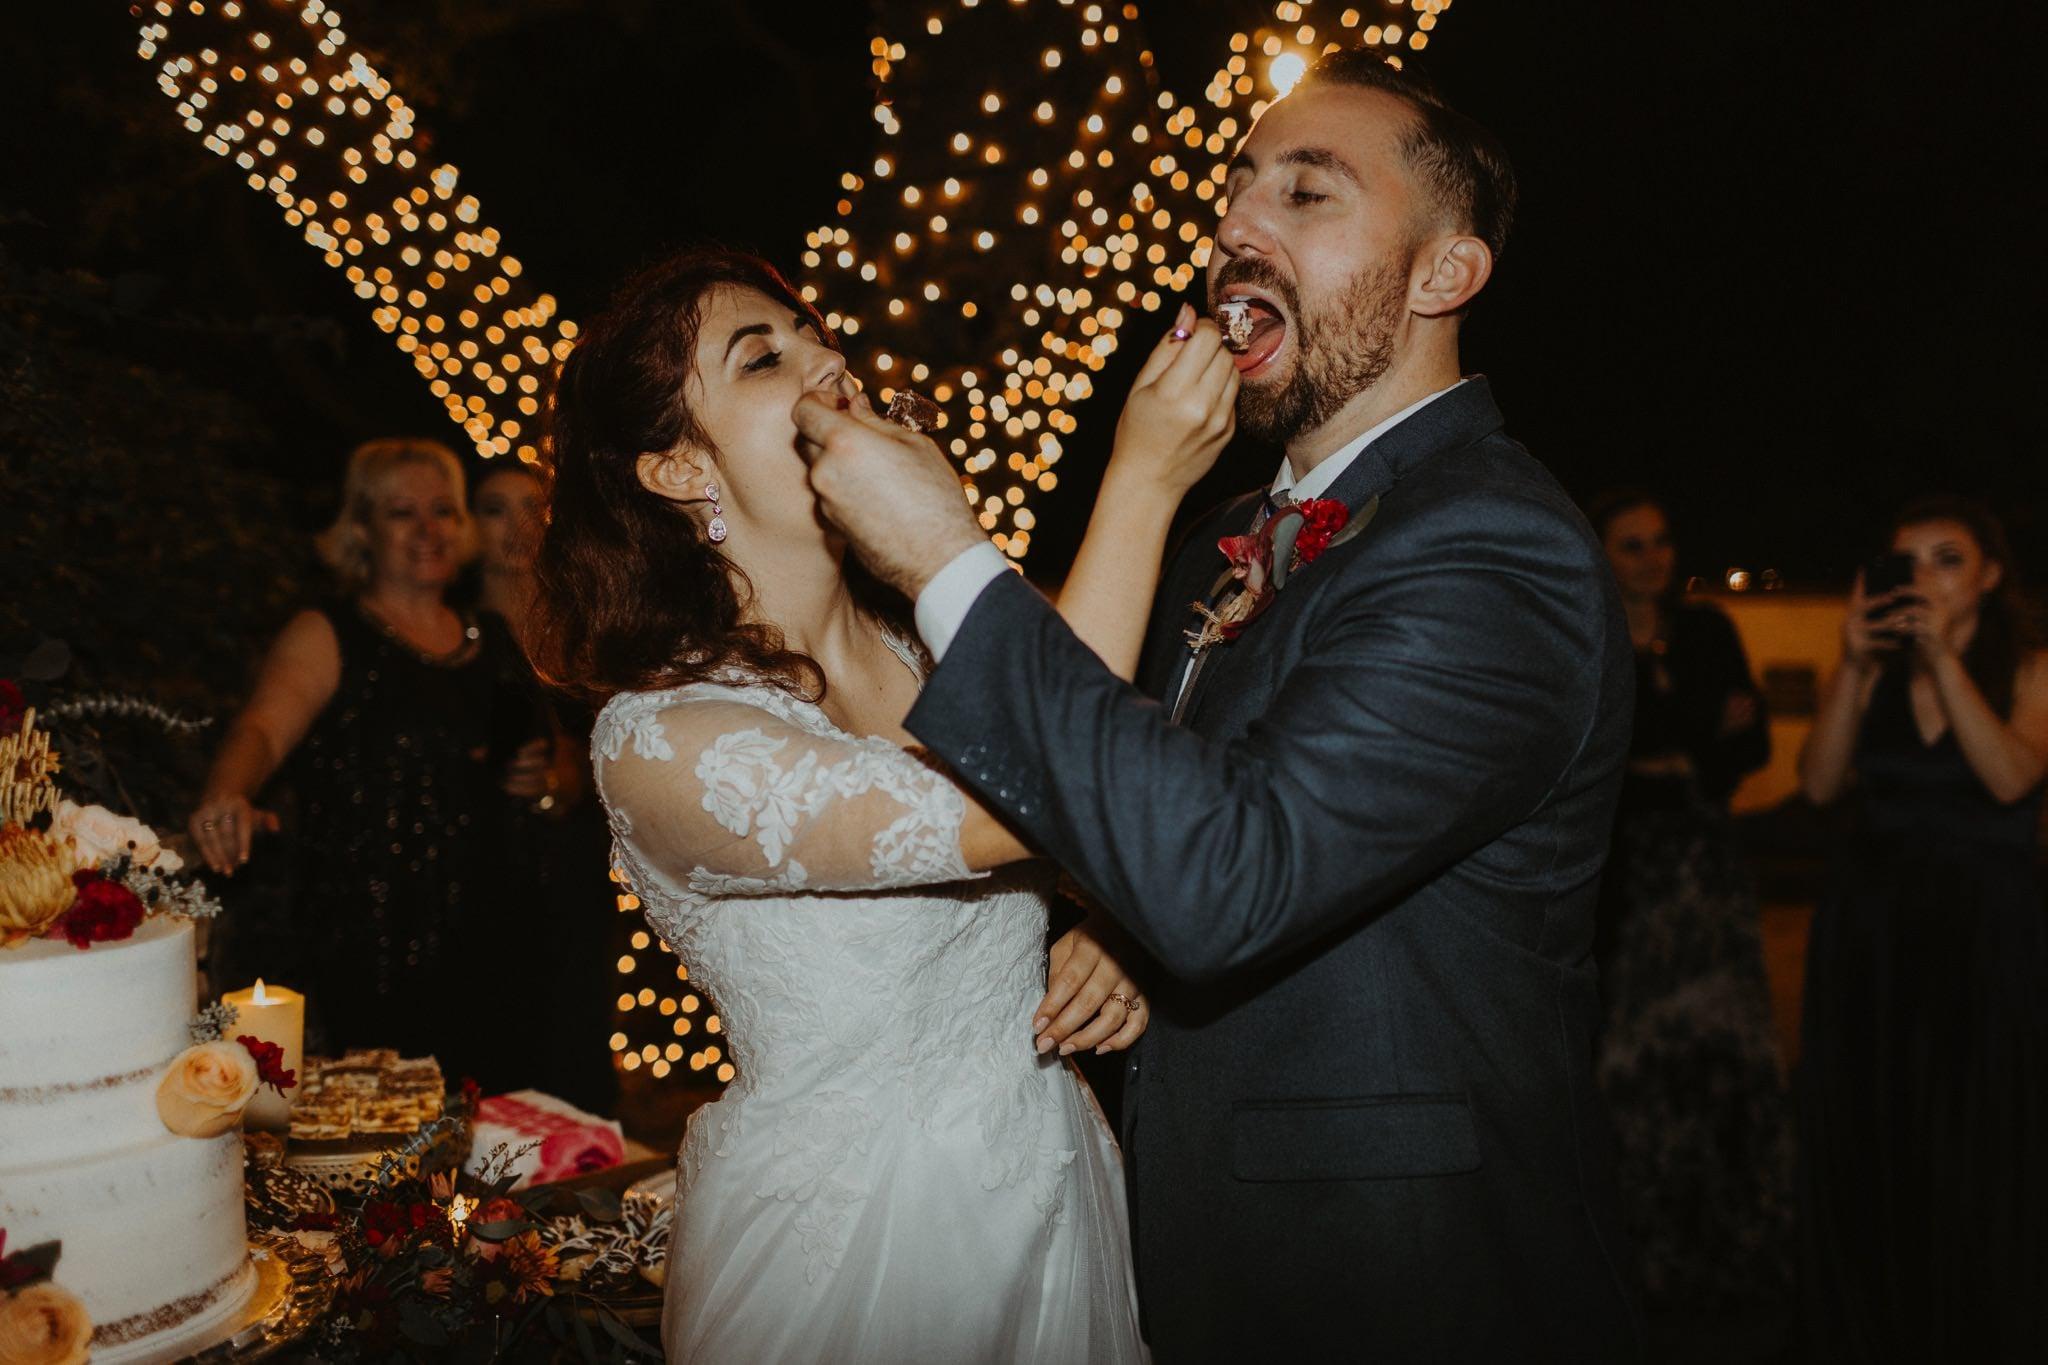 simi valley wedding photography 190